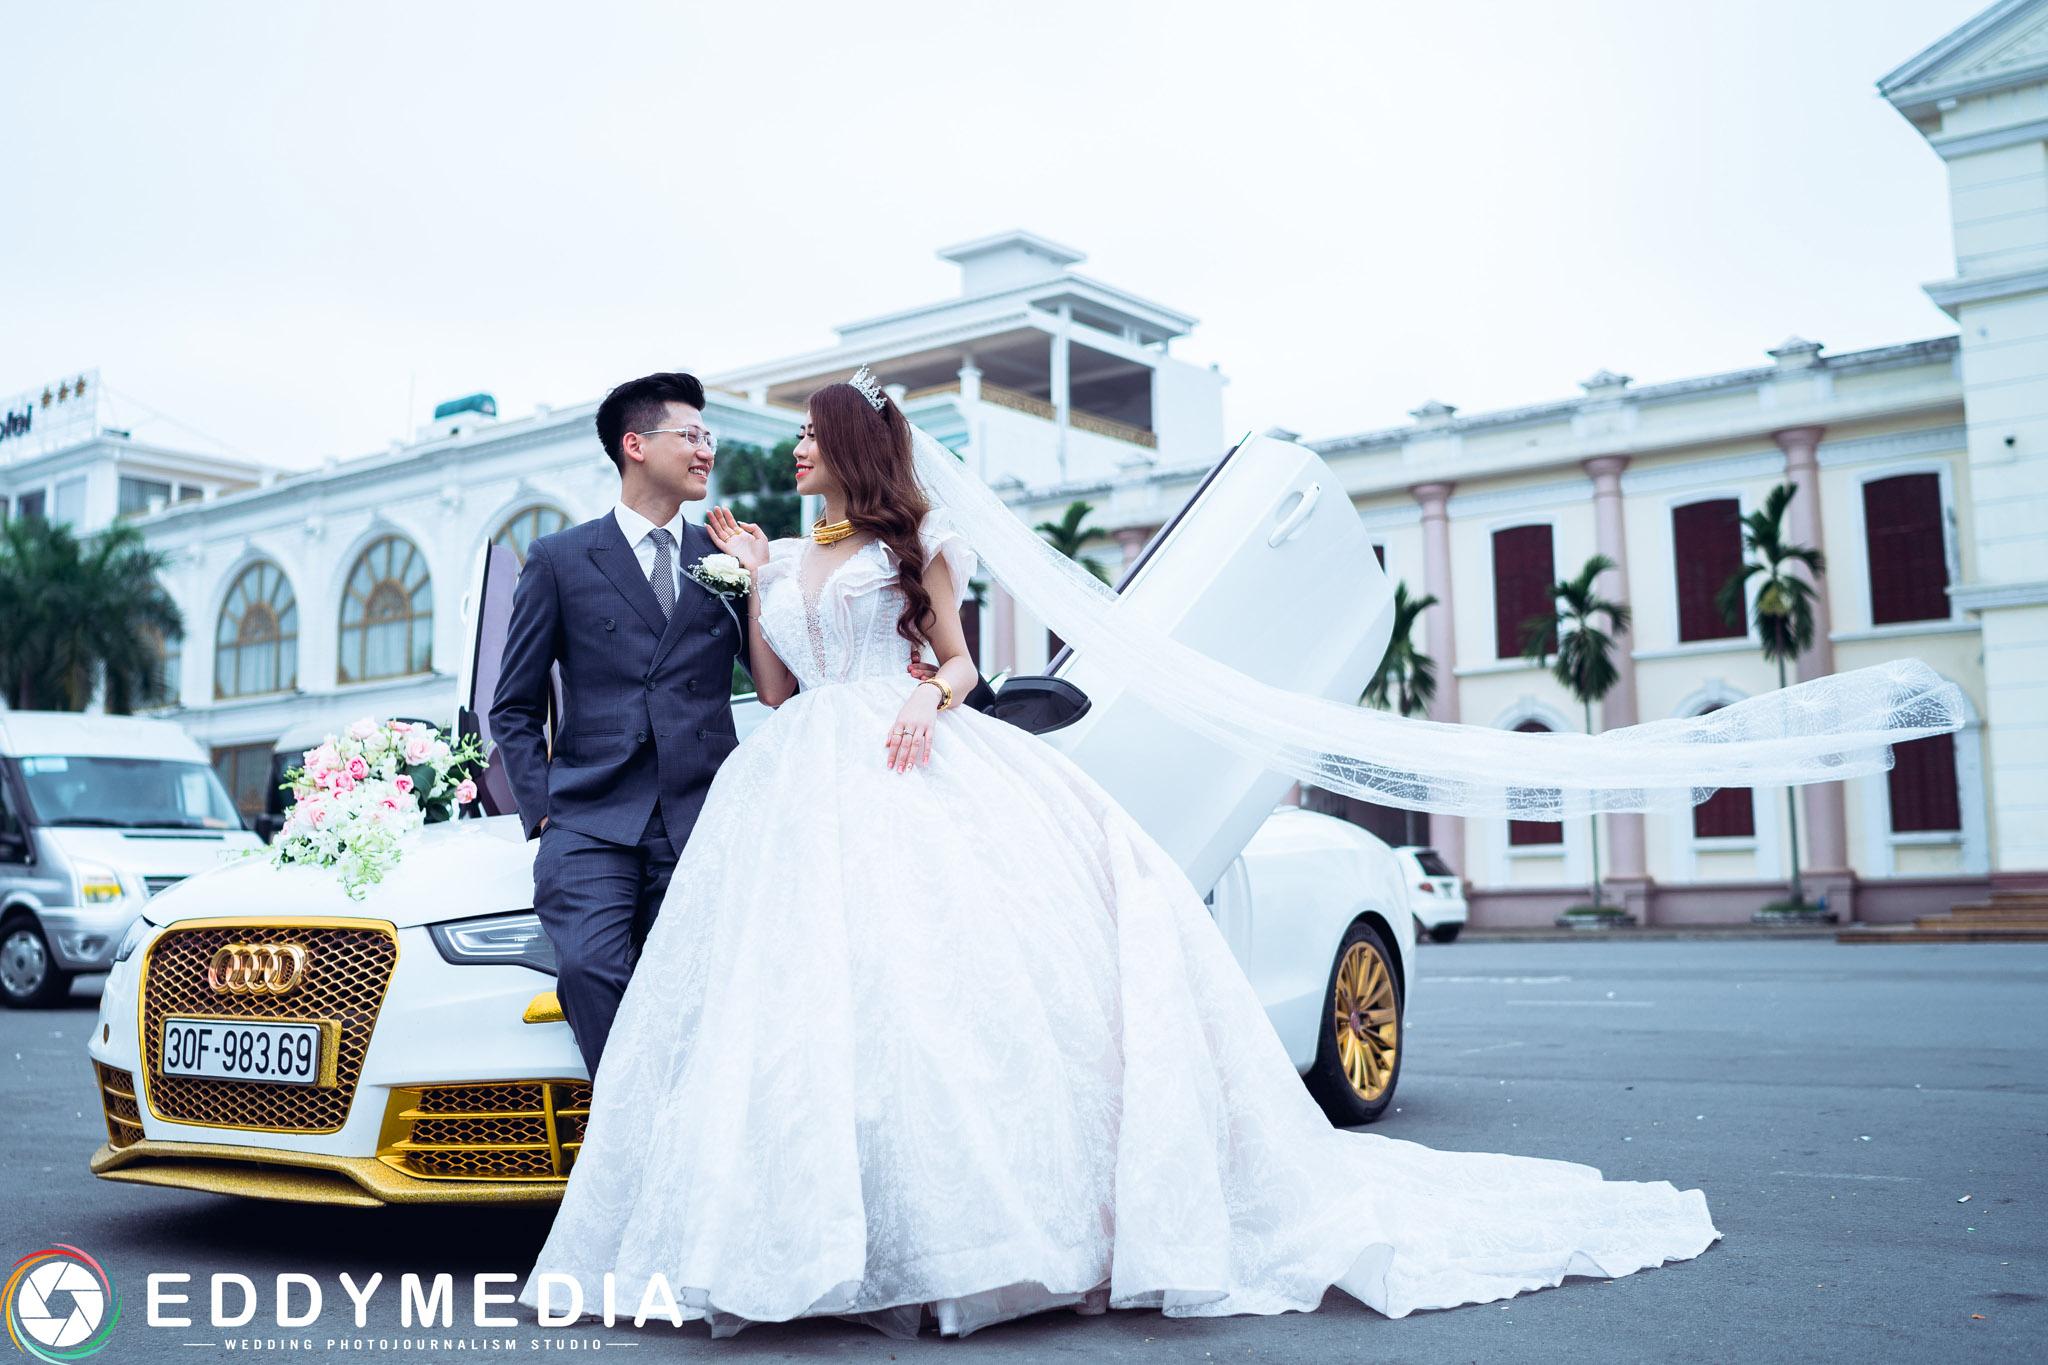 ThanhHai NhatAnh ViHoangNamDinh EddyMedia 93 lấy vợ giàu